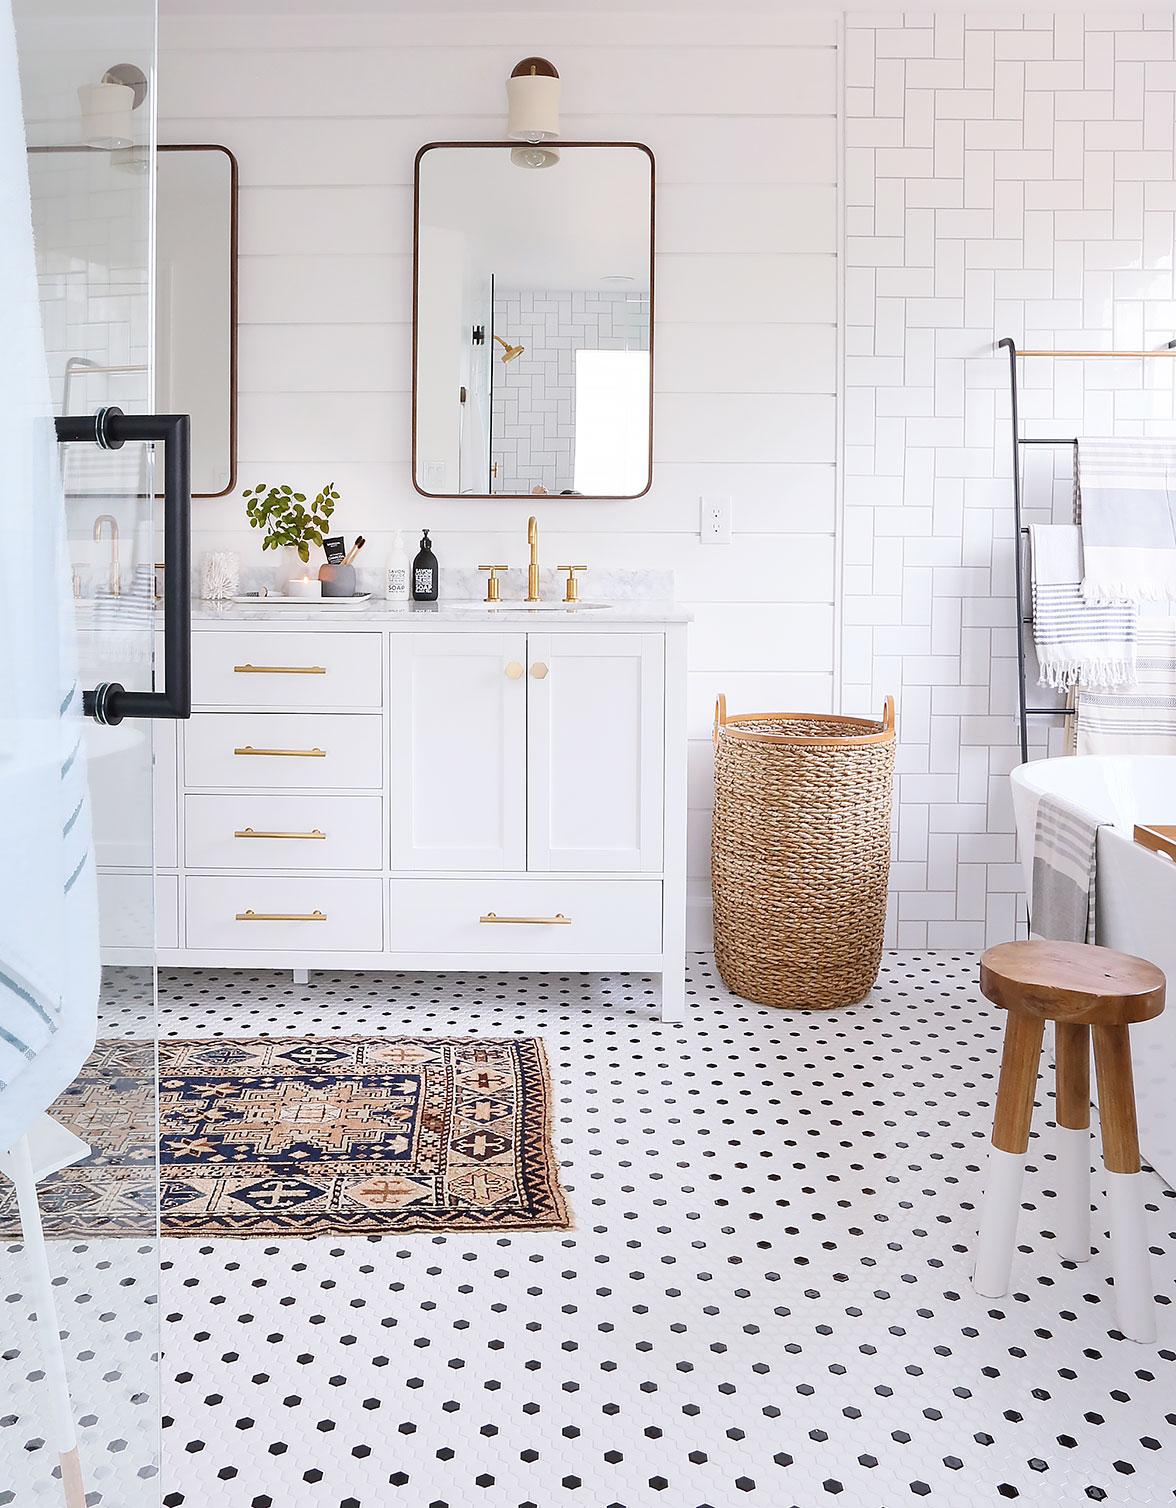 shower-view-blog.jpg